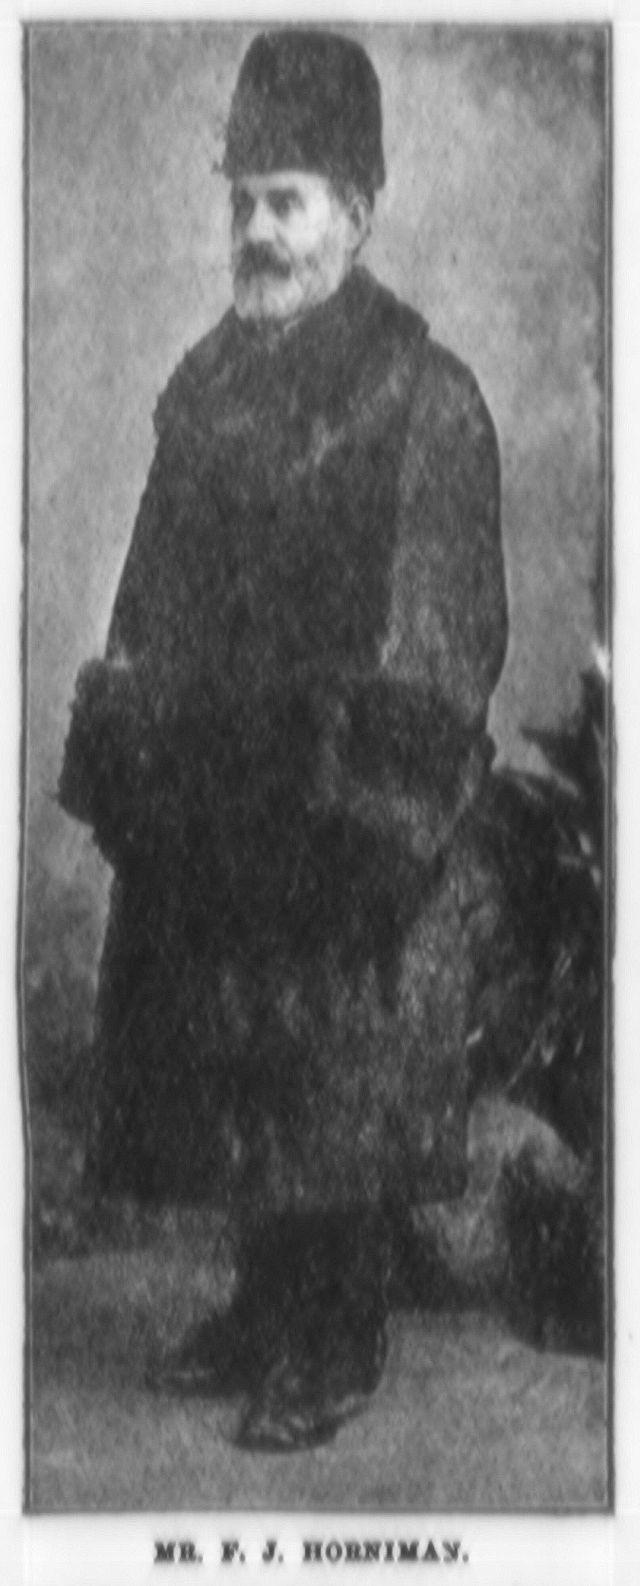 Frederick John Horniman